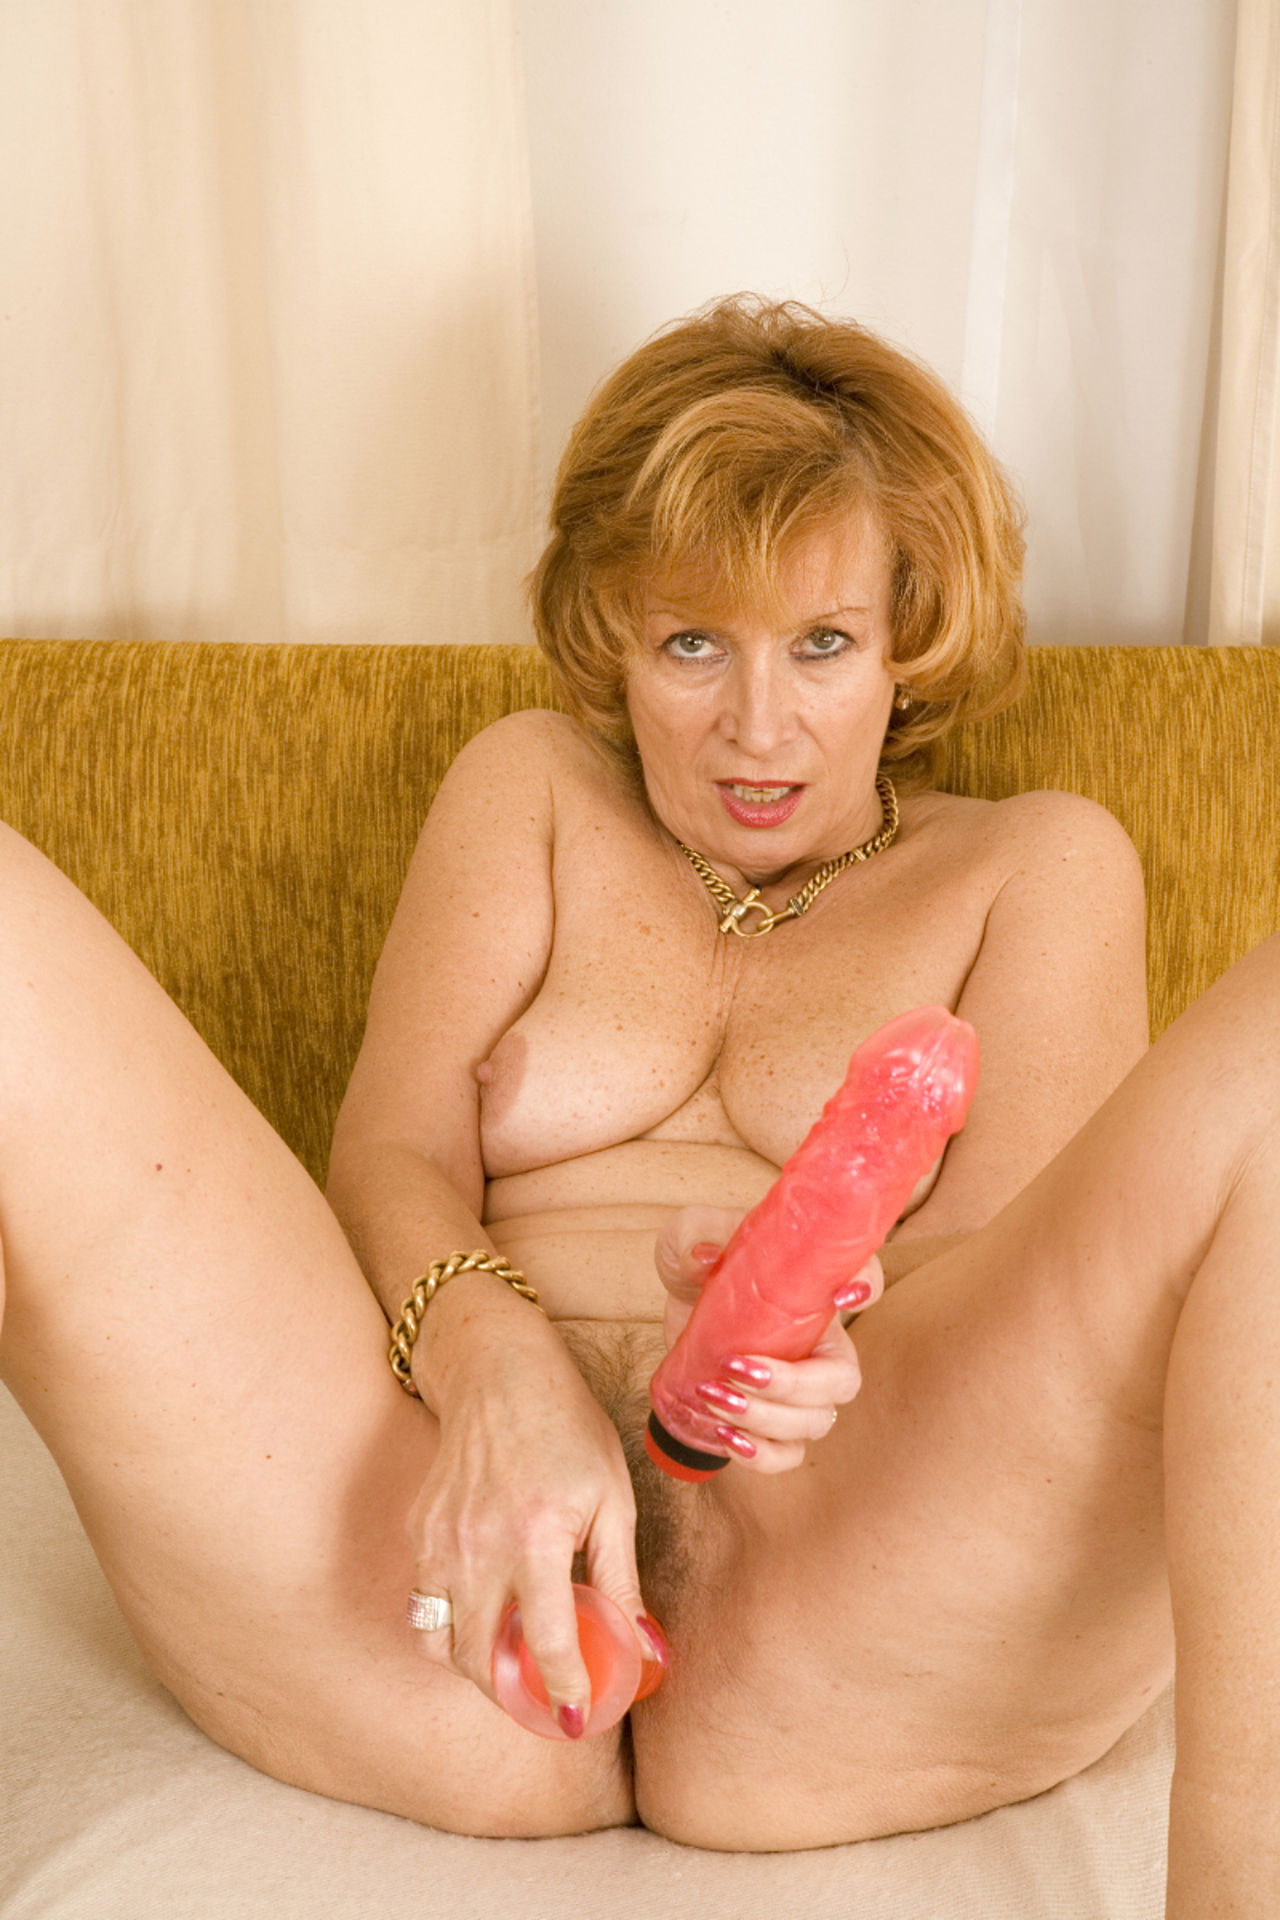 Horny Granny Masturbating Free Sex Pics